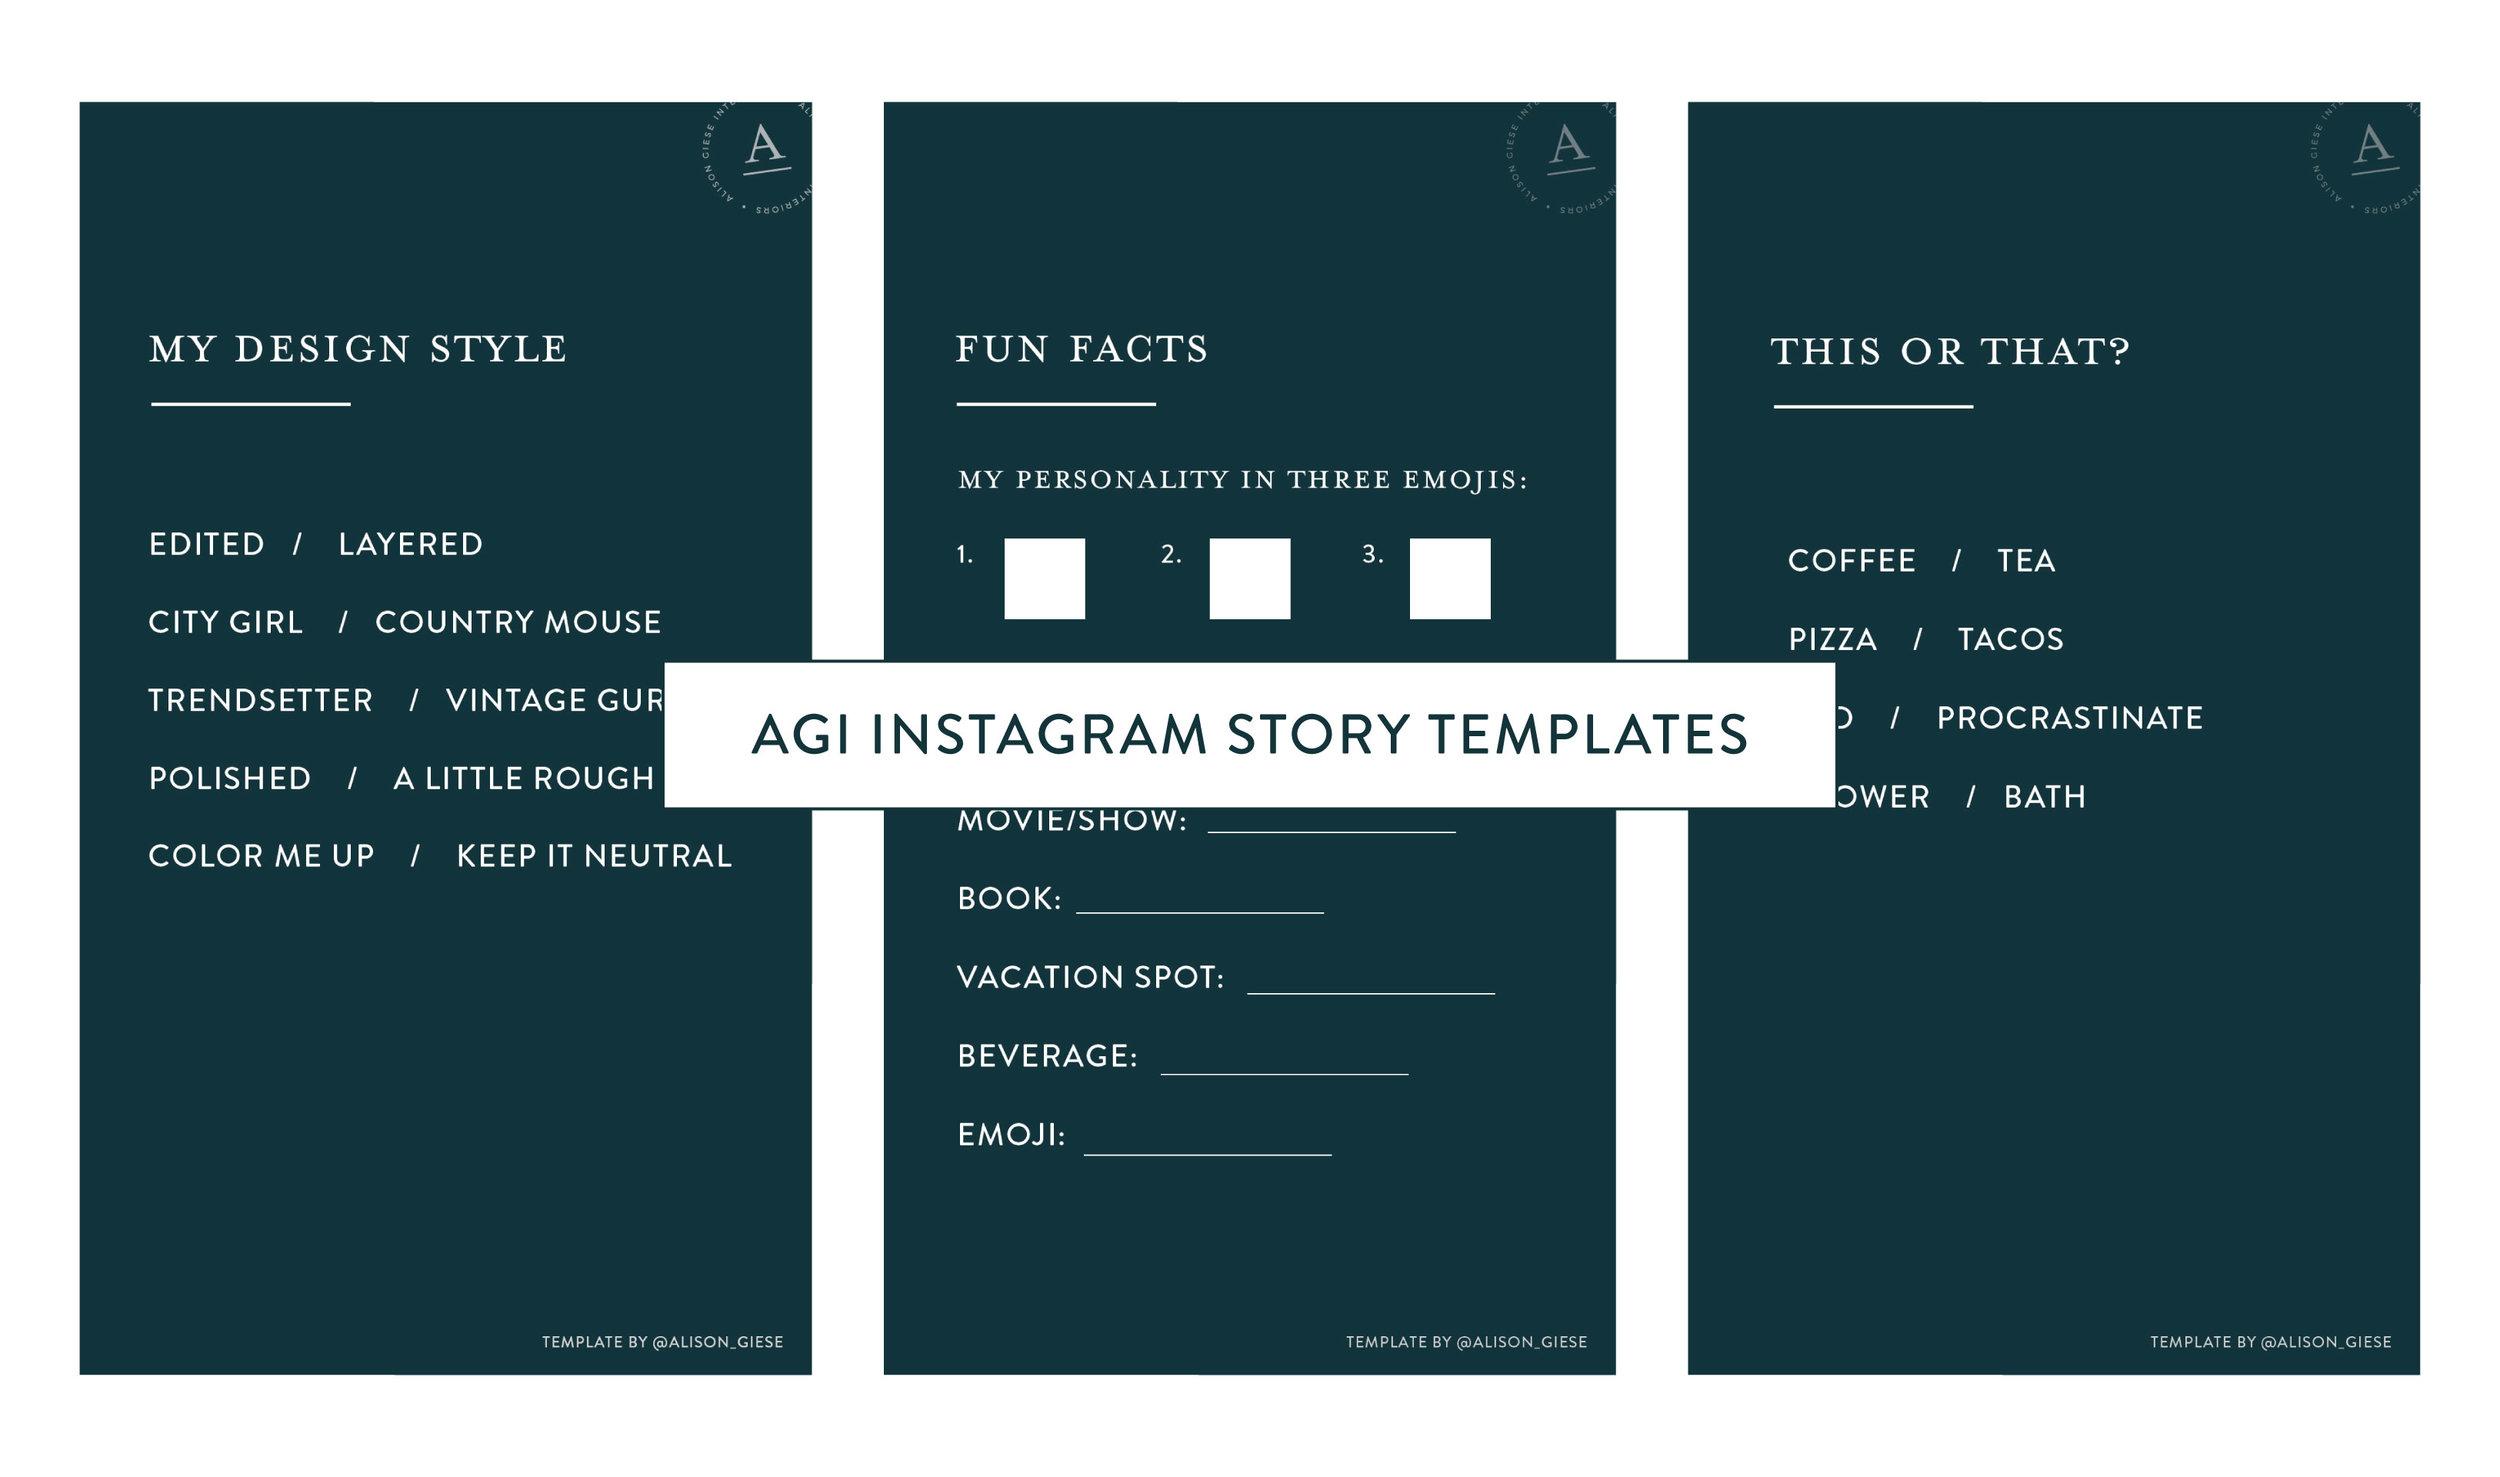 AGI-Story-Templates-Blog.jpg